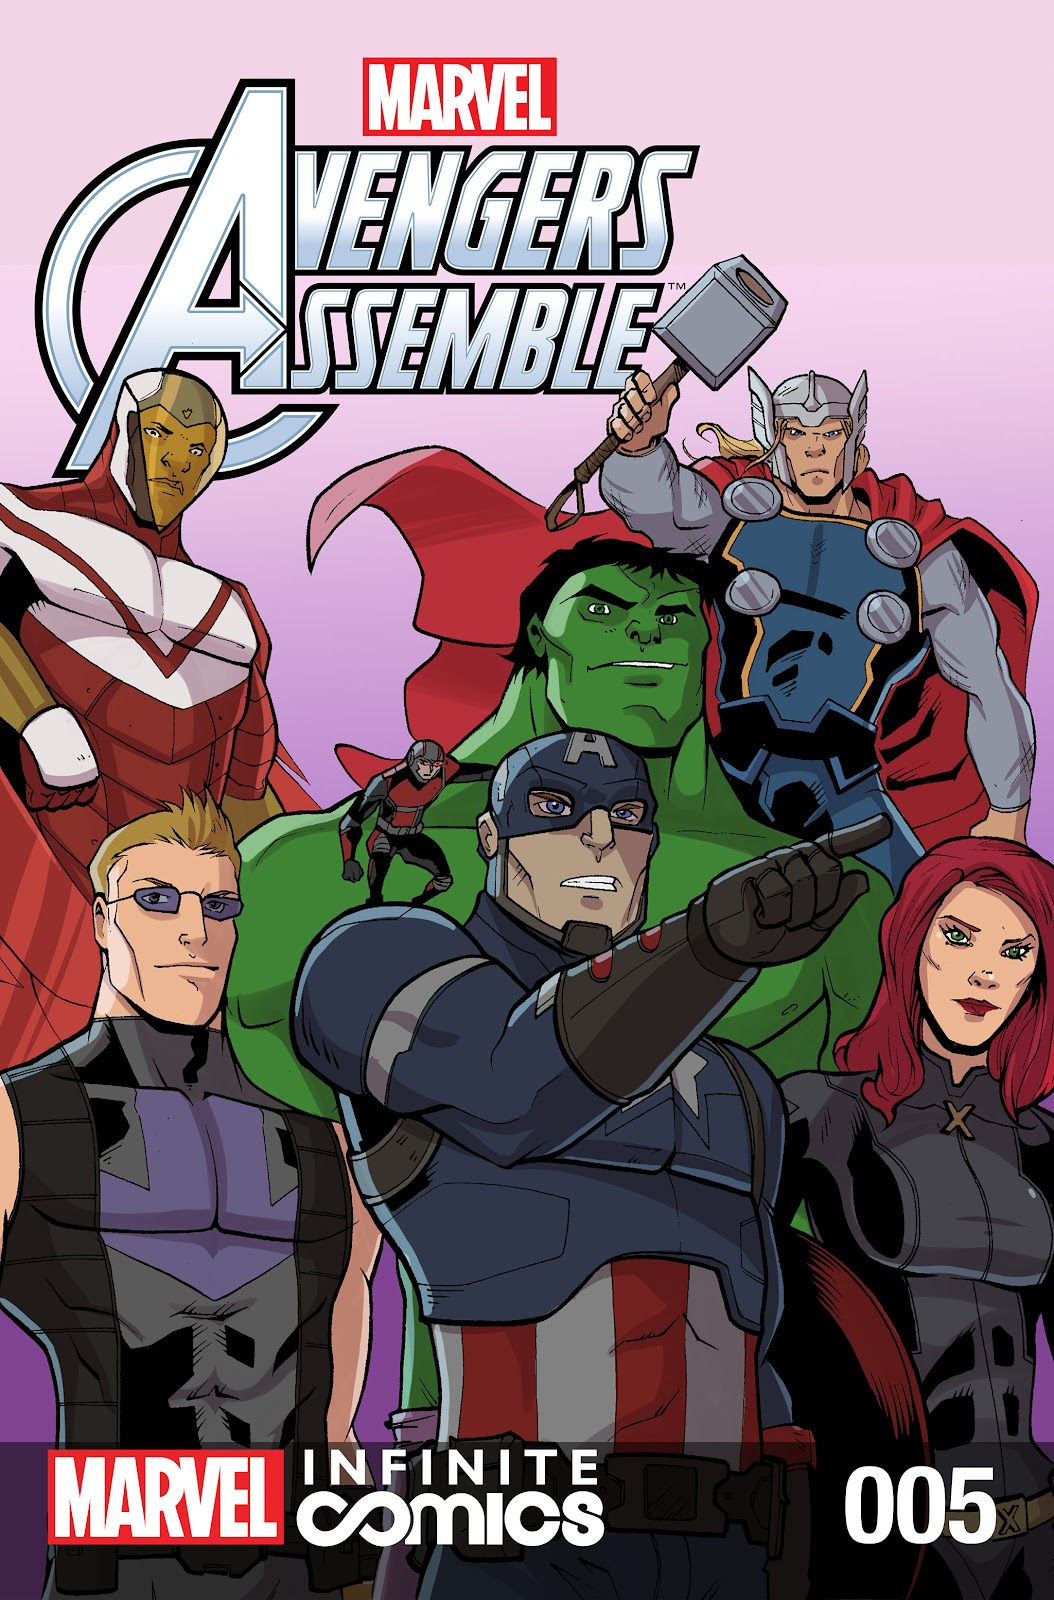 Marvel Universe Avengers Infinite Comic 5 Page 1